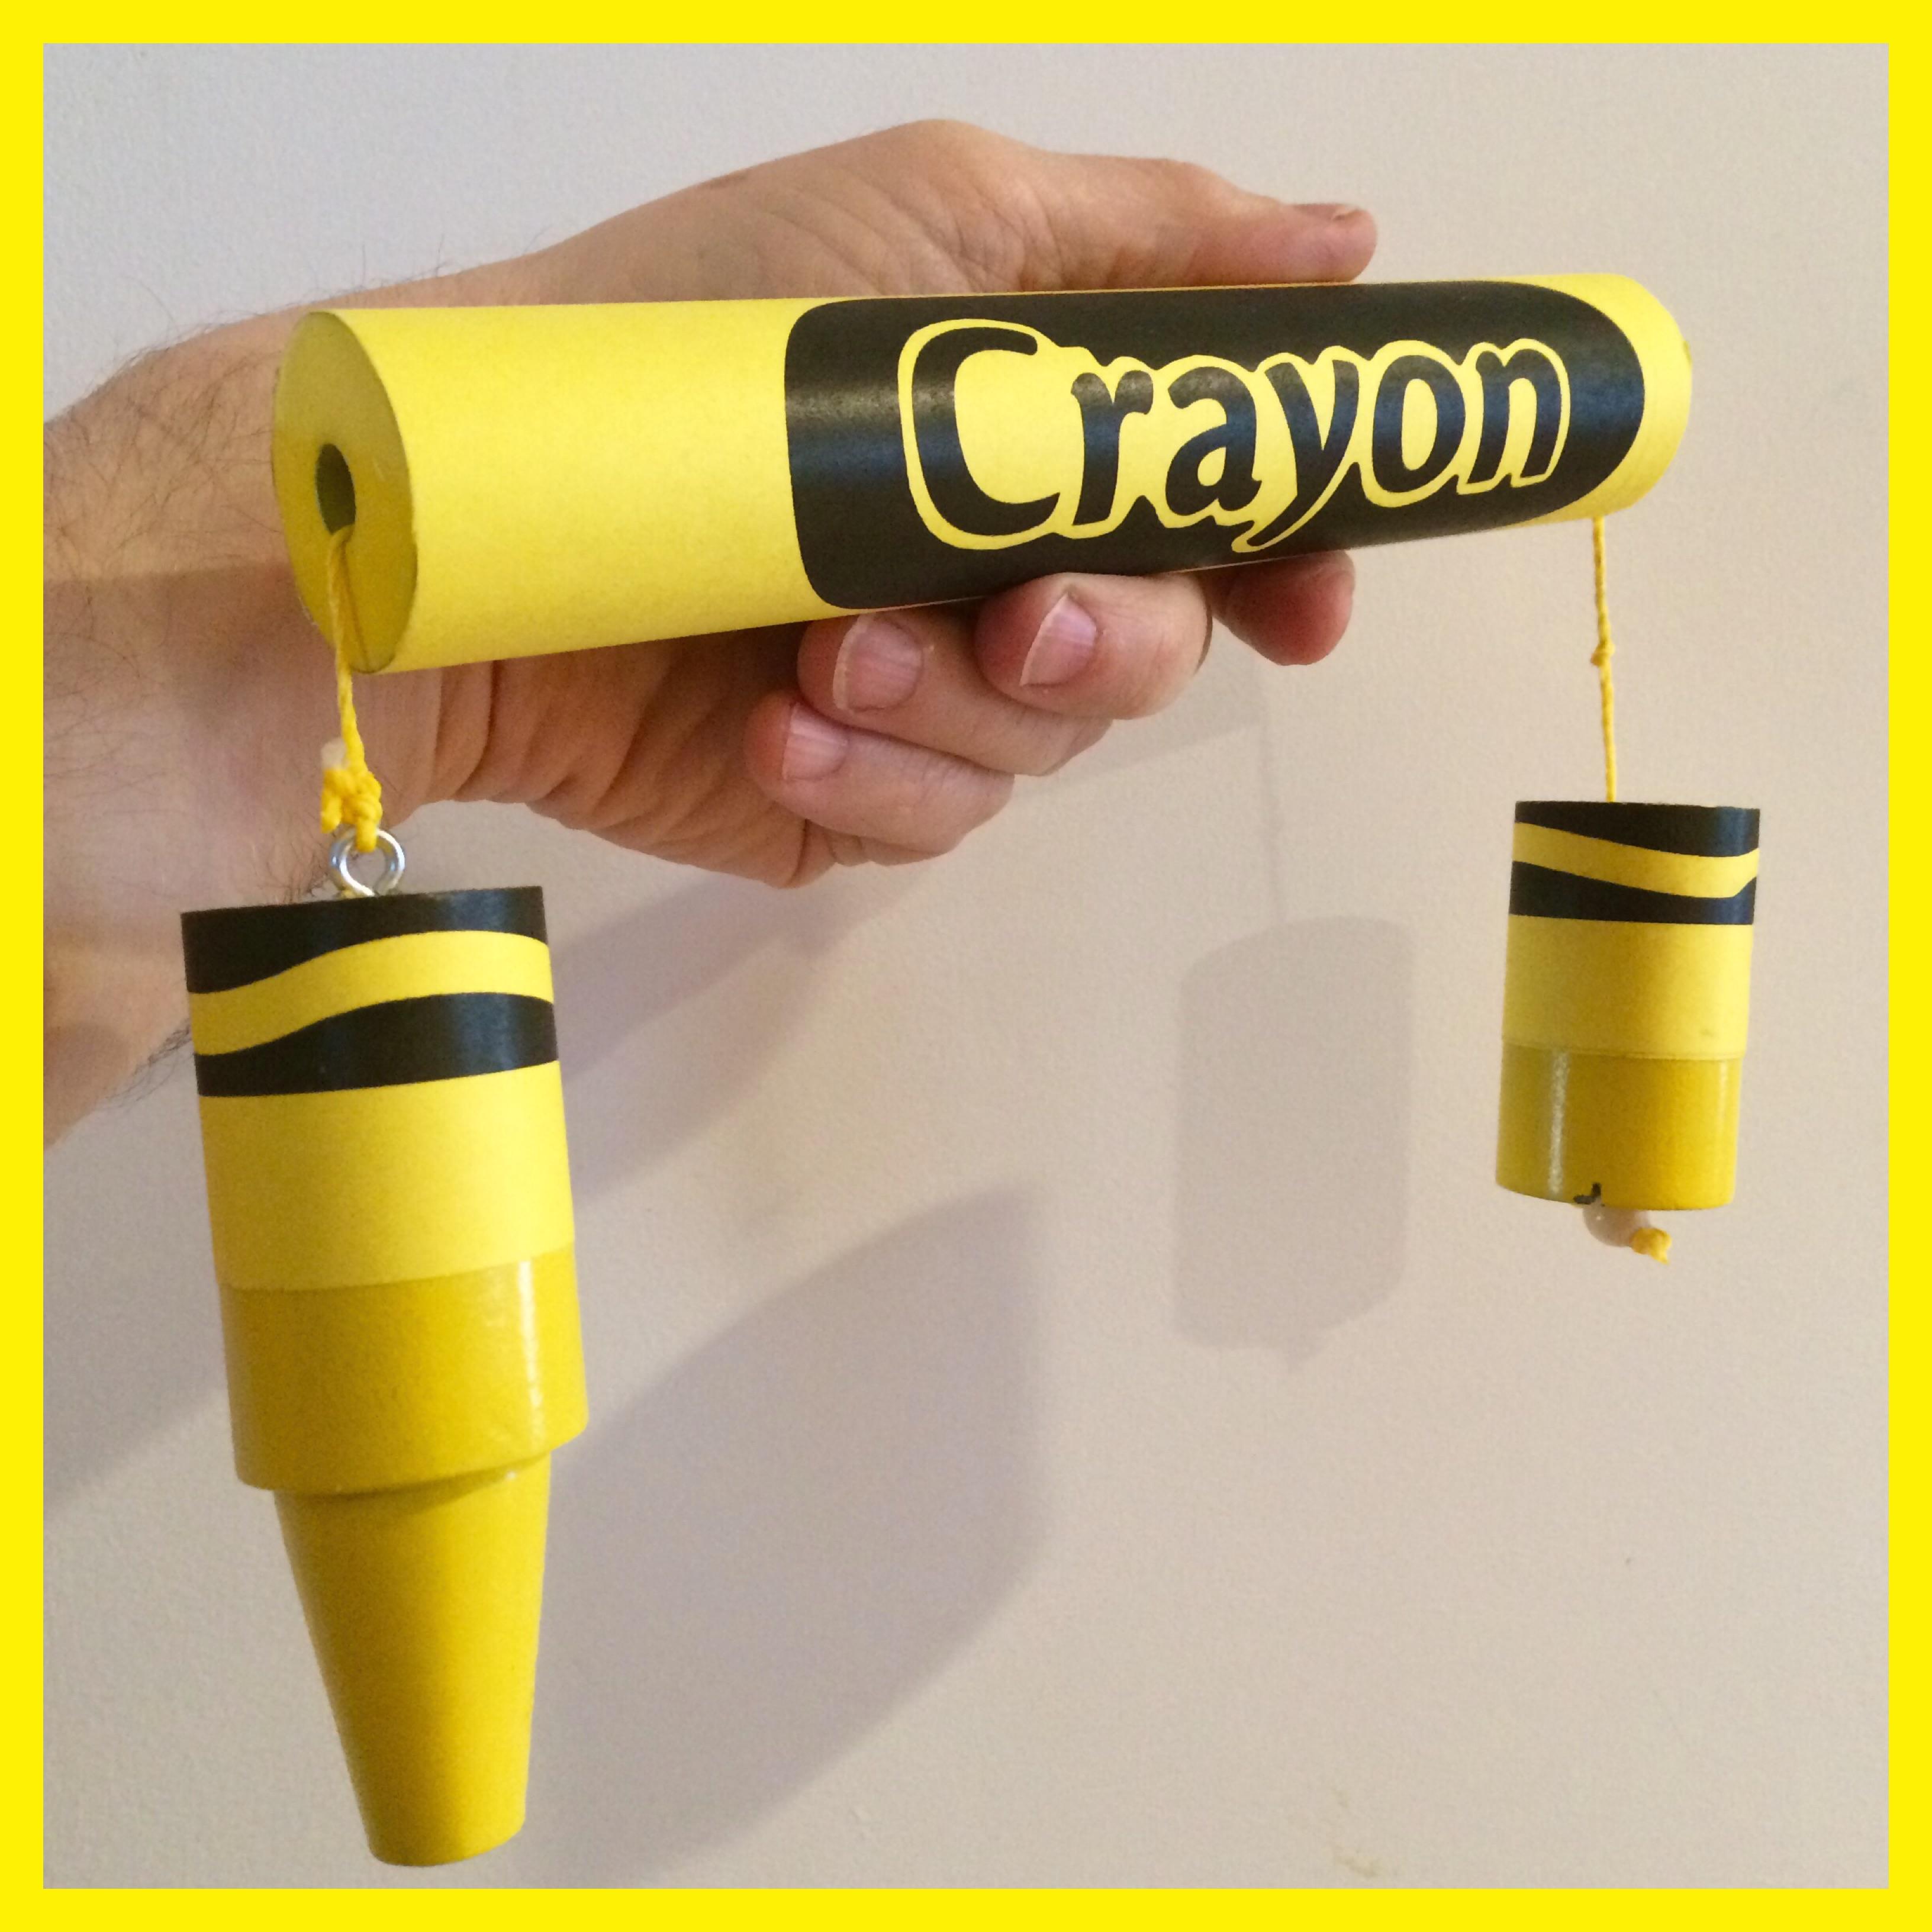 Breakaway Crayon - Yellow - magic